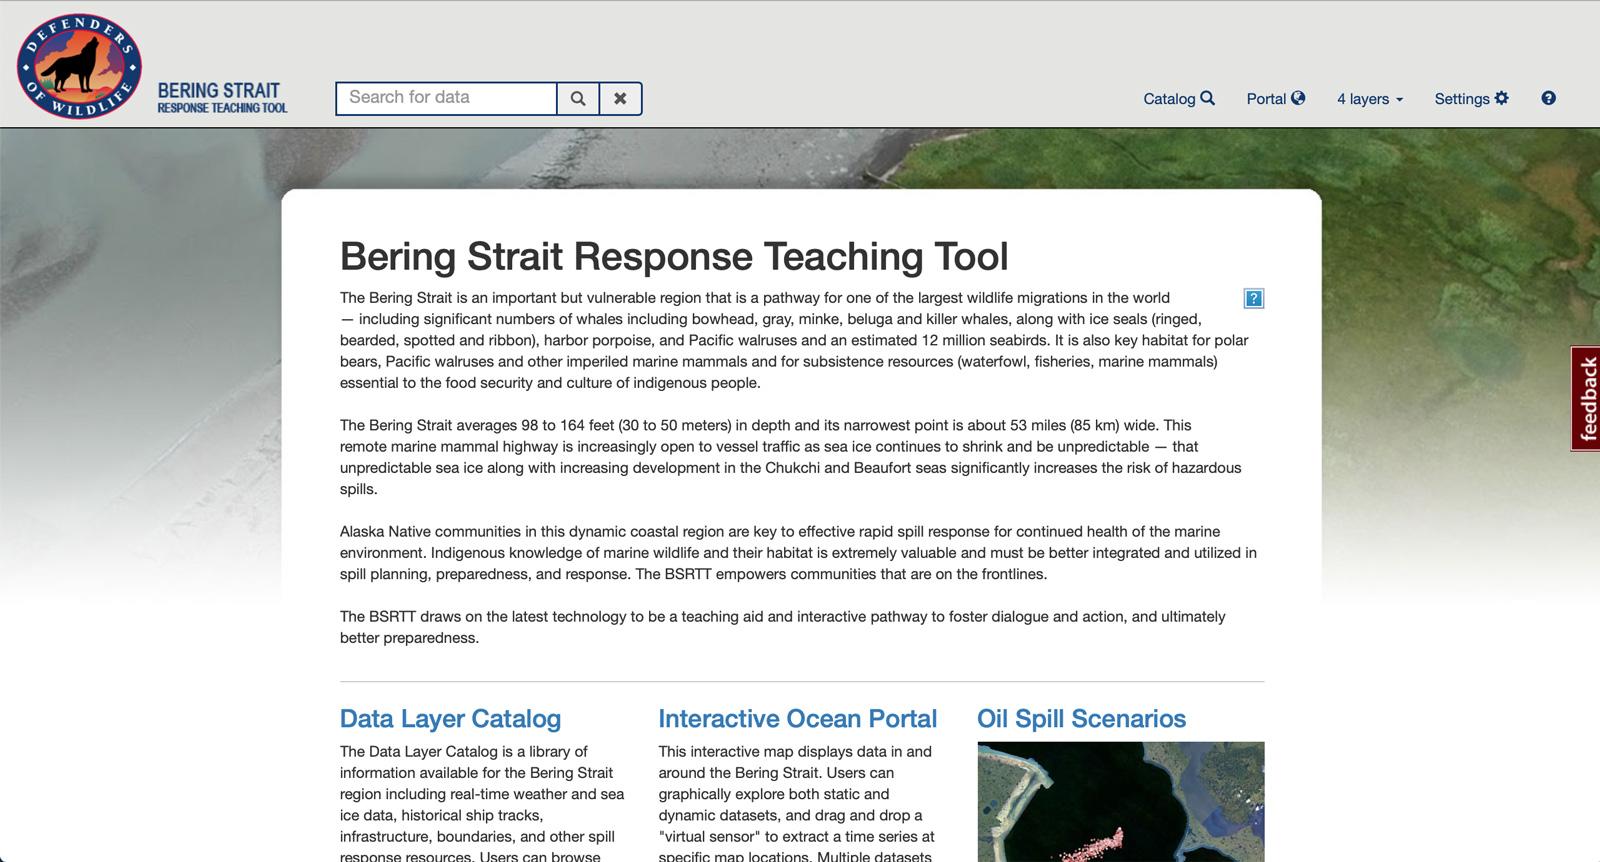 Screen grab of bering strait response teaching tool page in AOOS data portal.